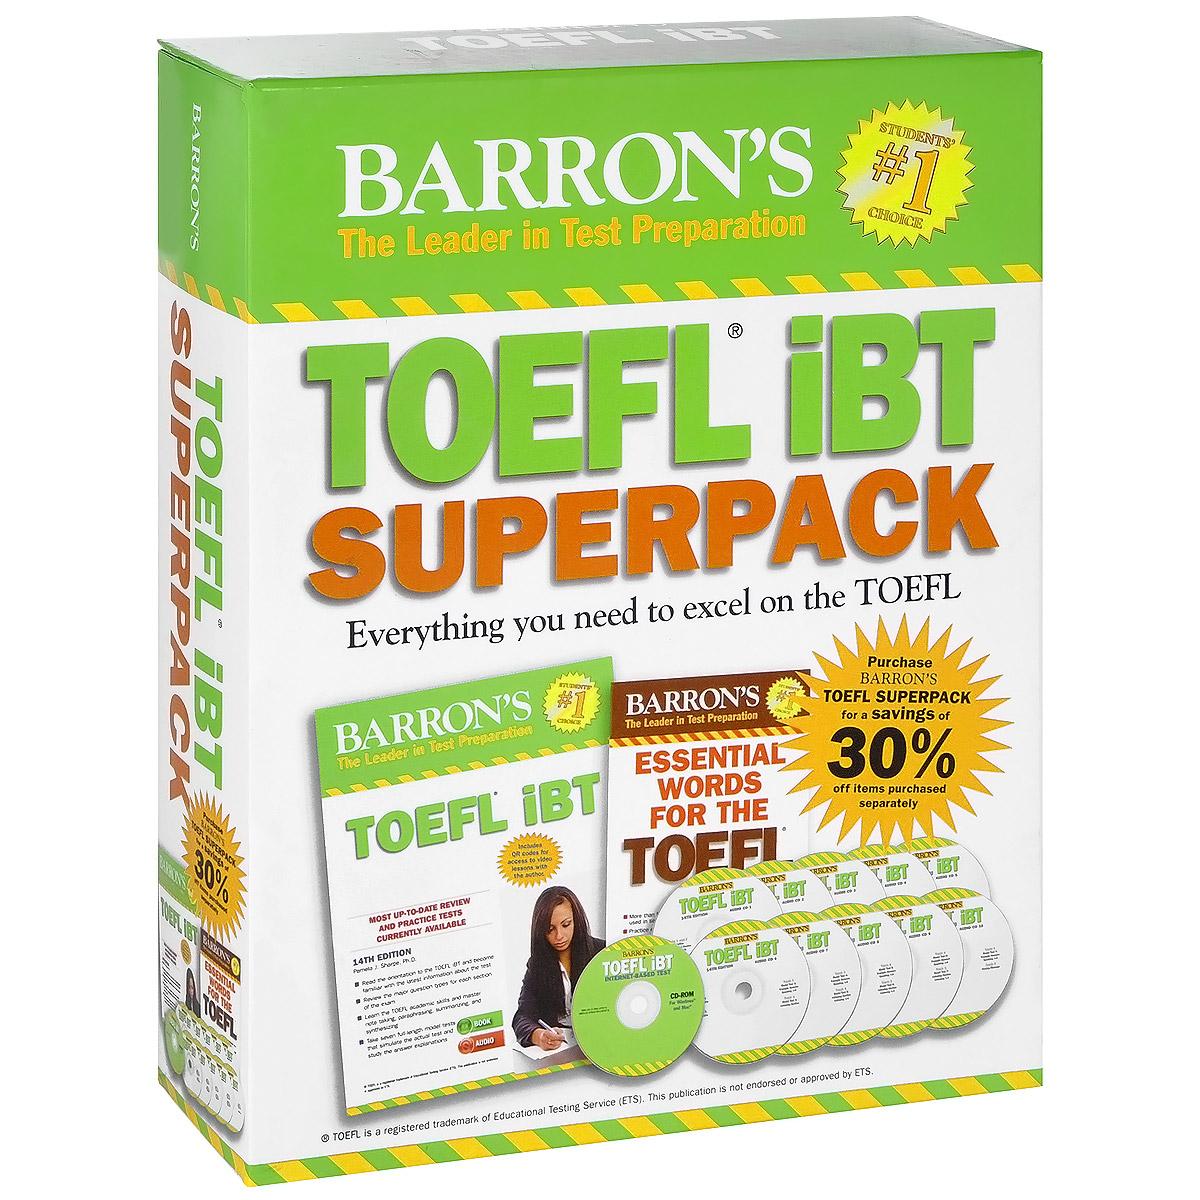 Barron's TOEFL iBT Superpack (комплект из 2 книг + 11 CD-ROM)